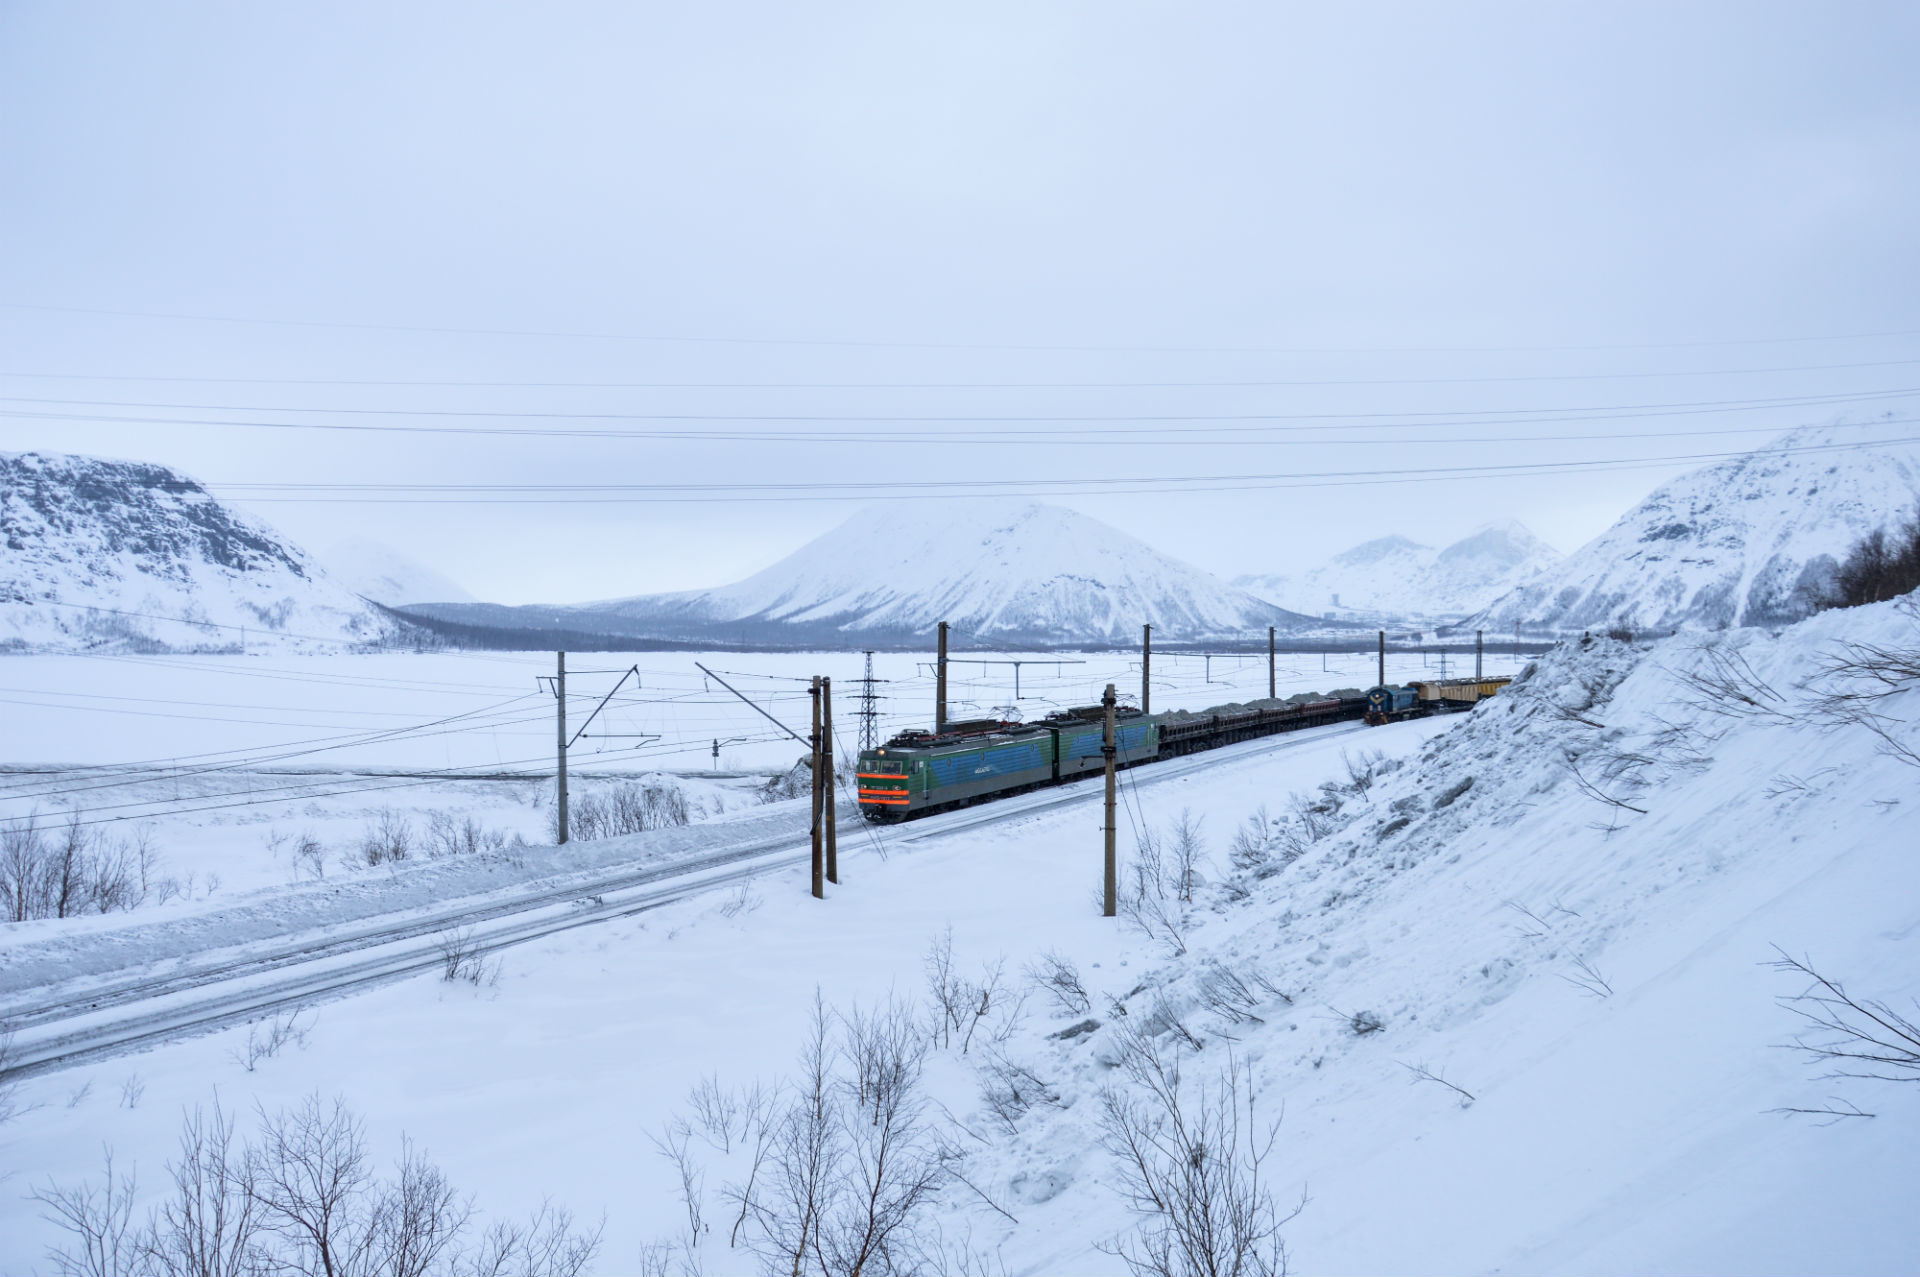 Rudarski vlak hrumi med gorami.